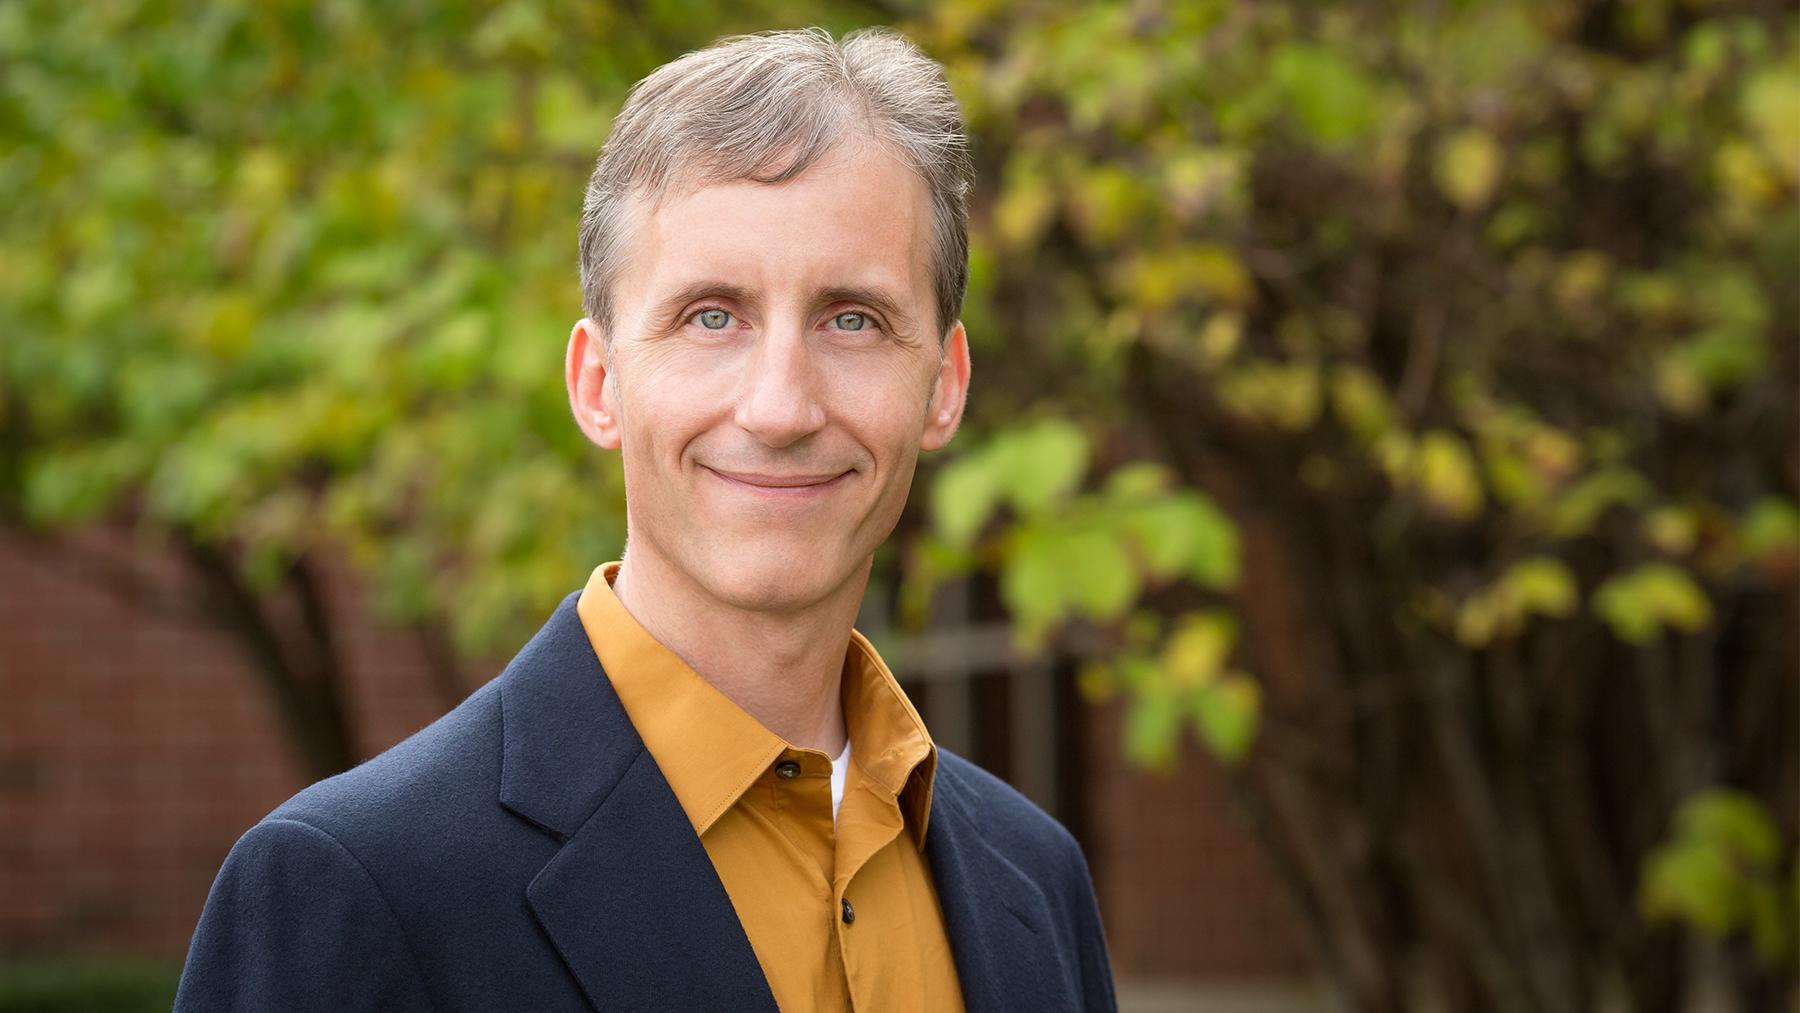 Professor Scott Althaus. Photo by L. Brian Stauffer